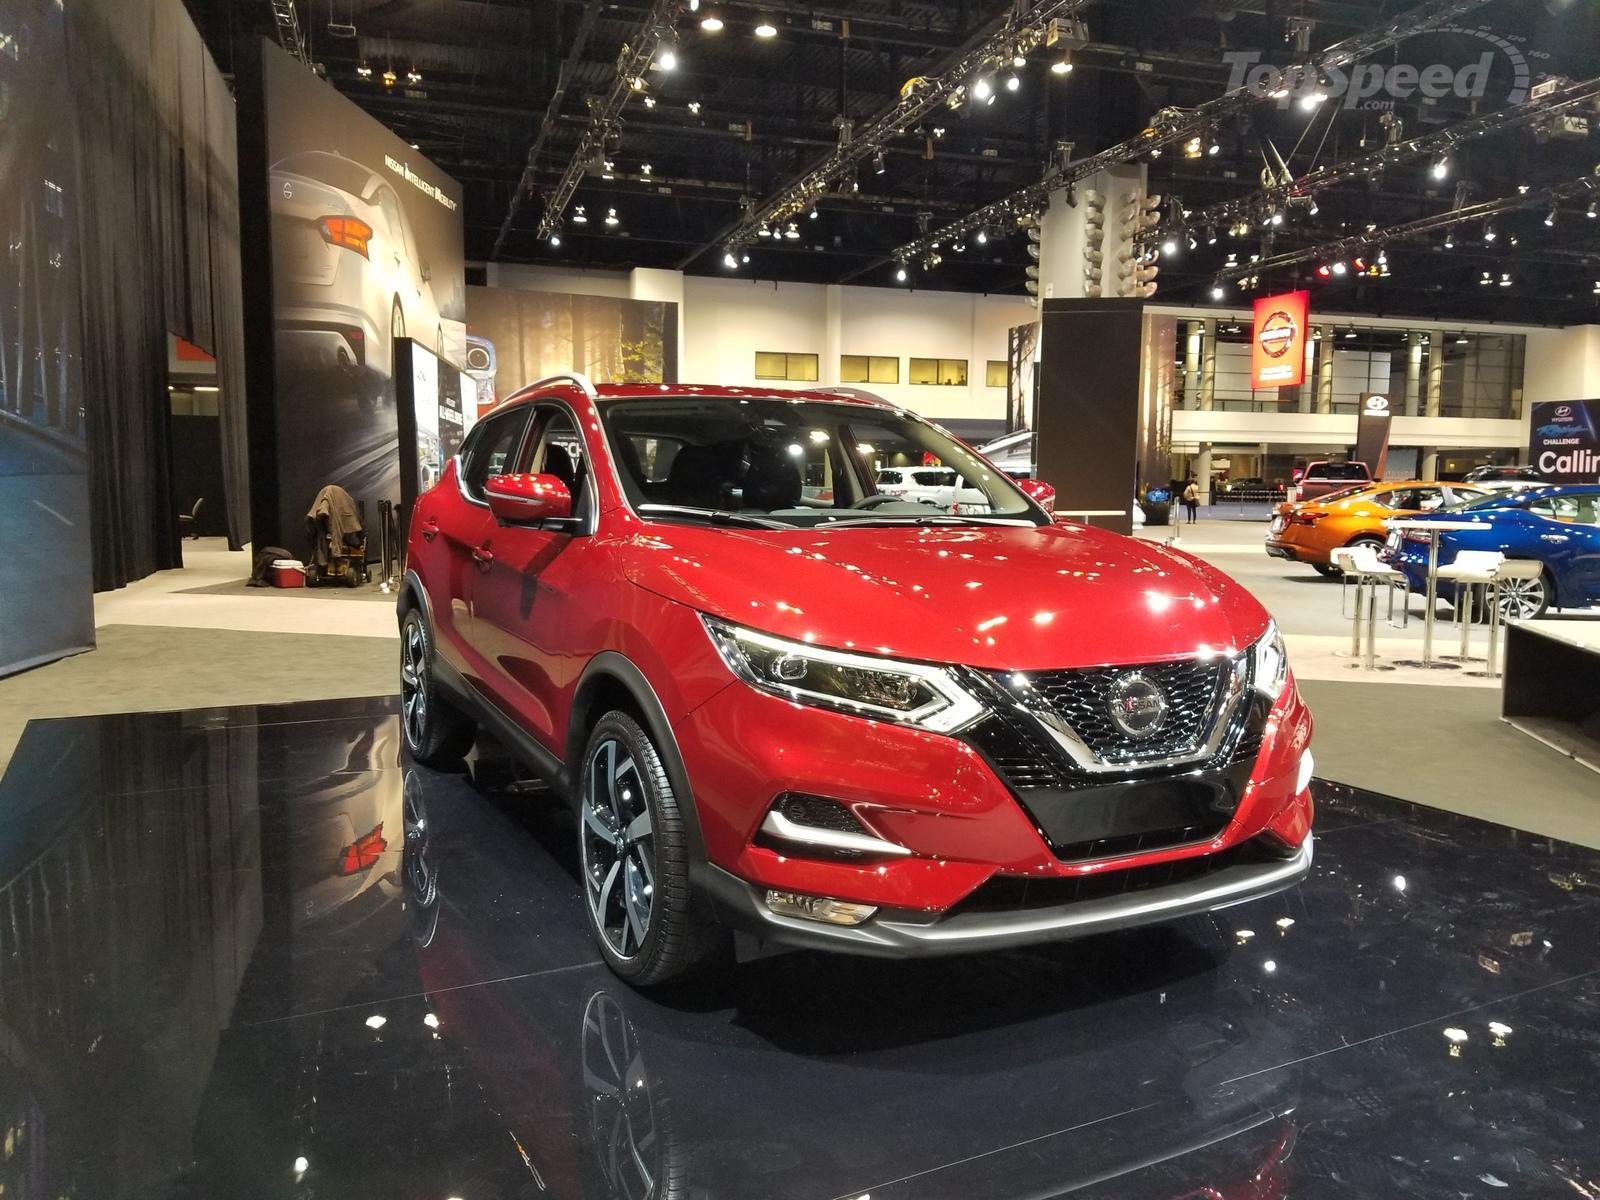 Arriving Soon The 2020 Nissan Qashqai Guelph Nissan